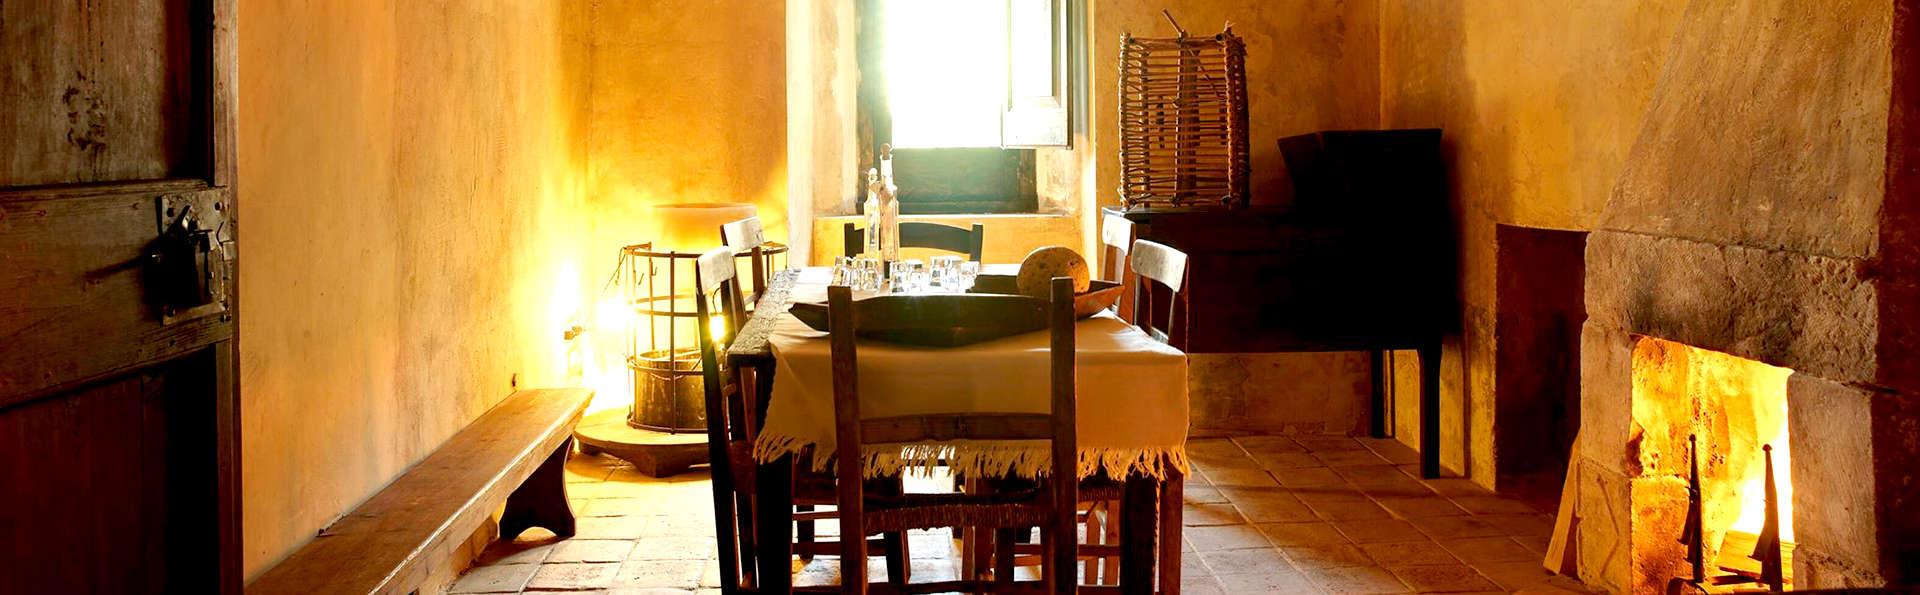 Sextantio Albergo Diffuso - Edit_Restaurant.jpg